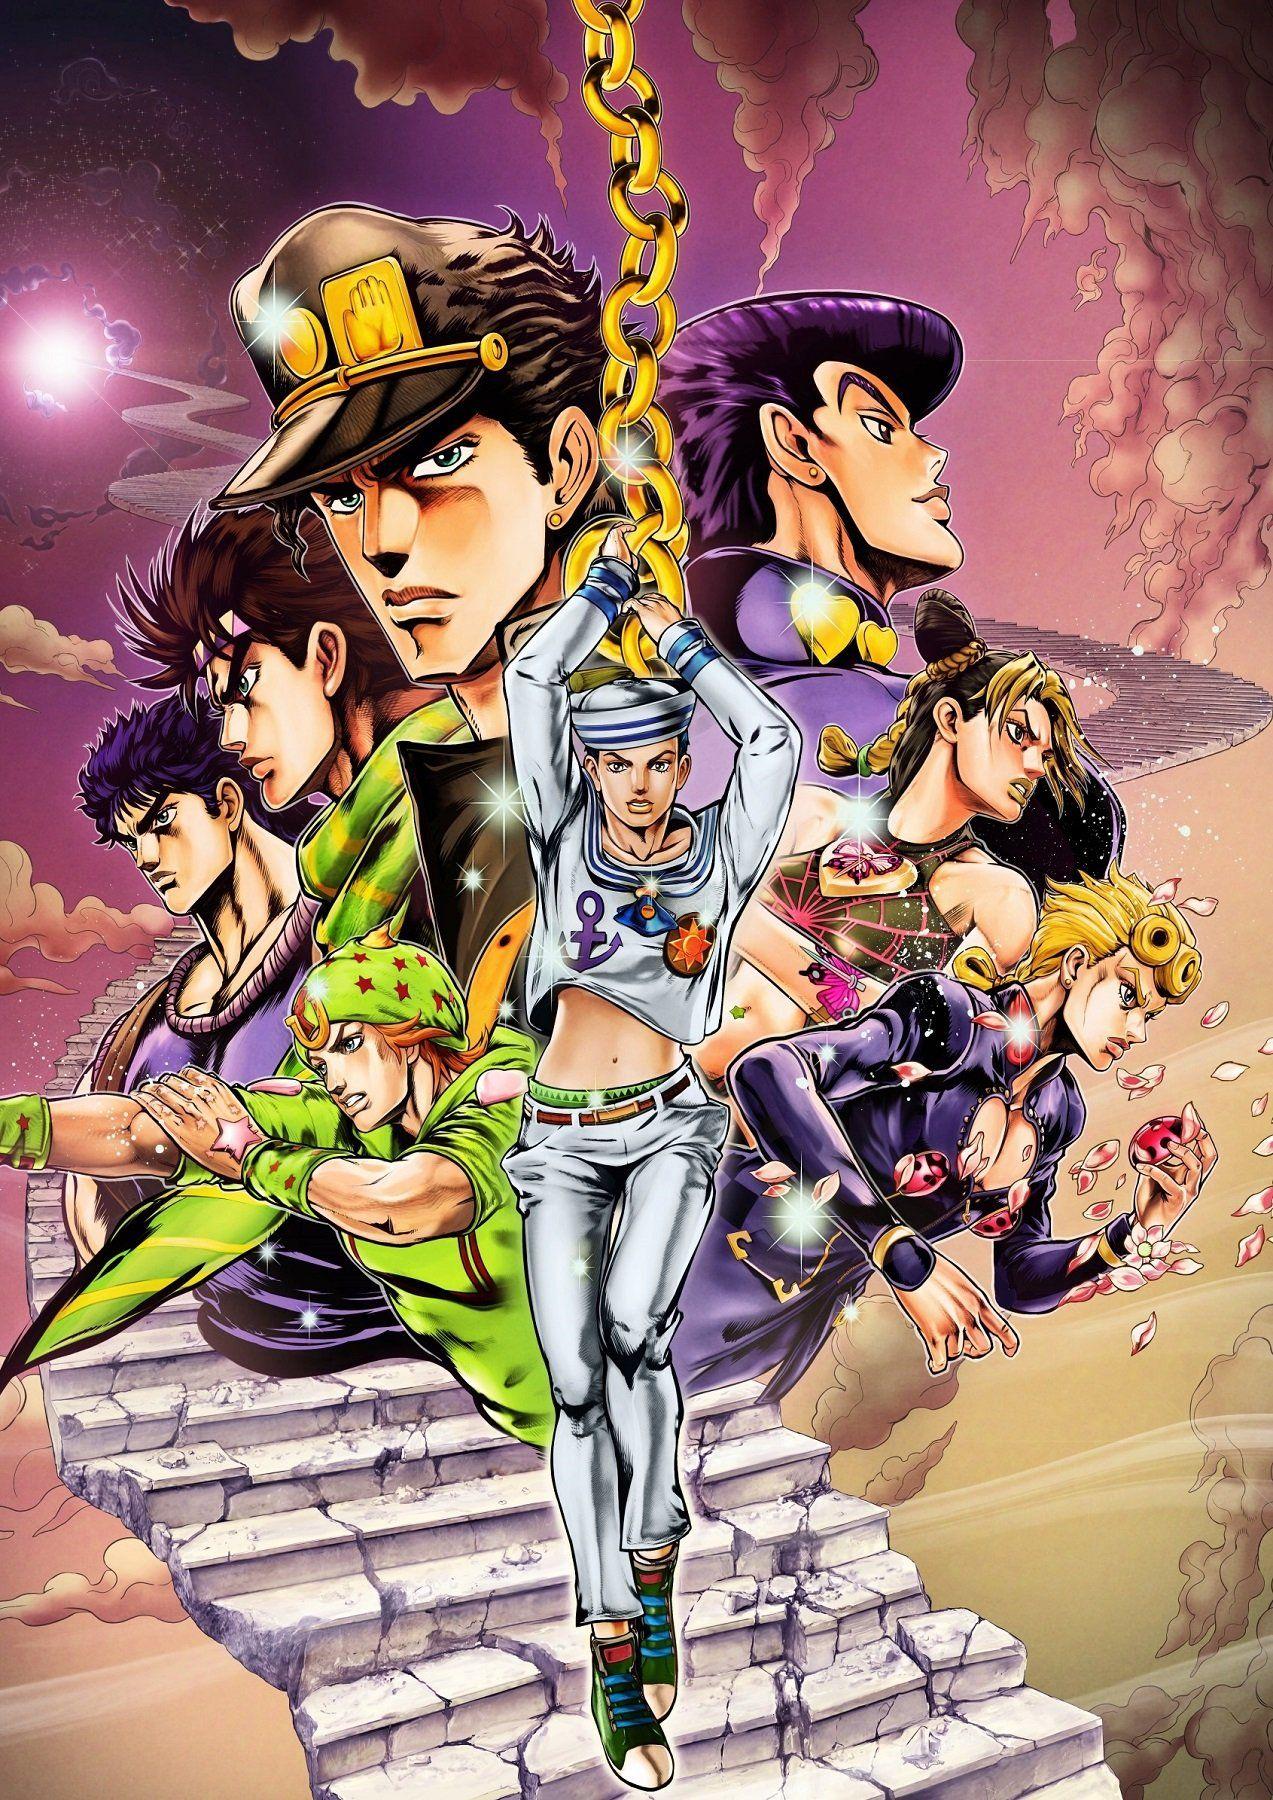 Jojo S Bizarre Adventure Eyes Of Heaven Poster Jojo S Bizarre Adventure Anime Jojo S Bizarre Adventure Game Jojo Anime